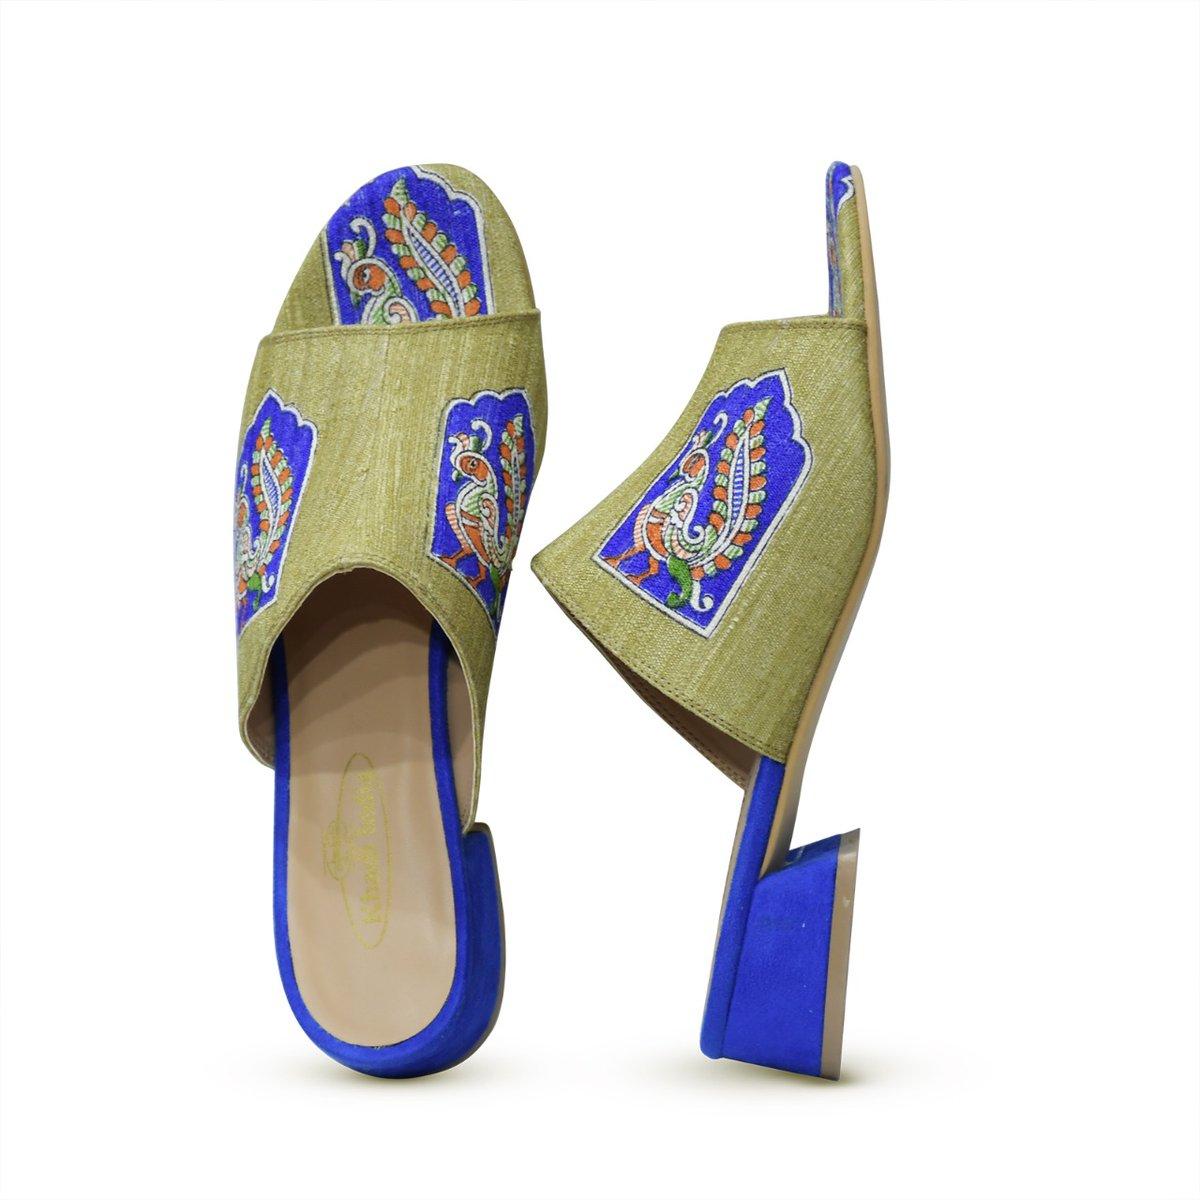 "Chairman KVIC on Twitter: ""Hon'ble Minister MSME Shri @nitin_gadkari ji &  Hon'ble Shri @pcsarangi ji launched India's First Khadi Fabric Footwear, a  historic step towards Local to Global.Exquisite fabric like Patola &"